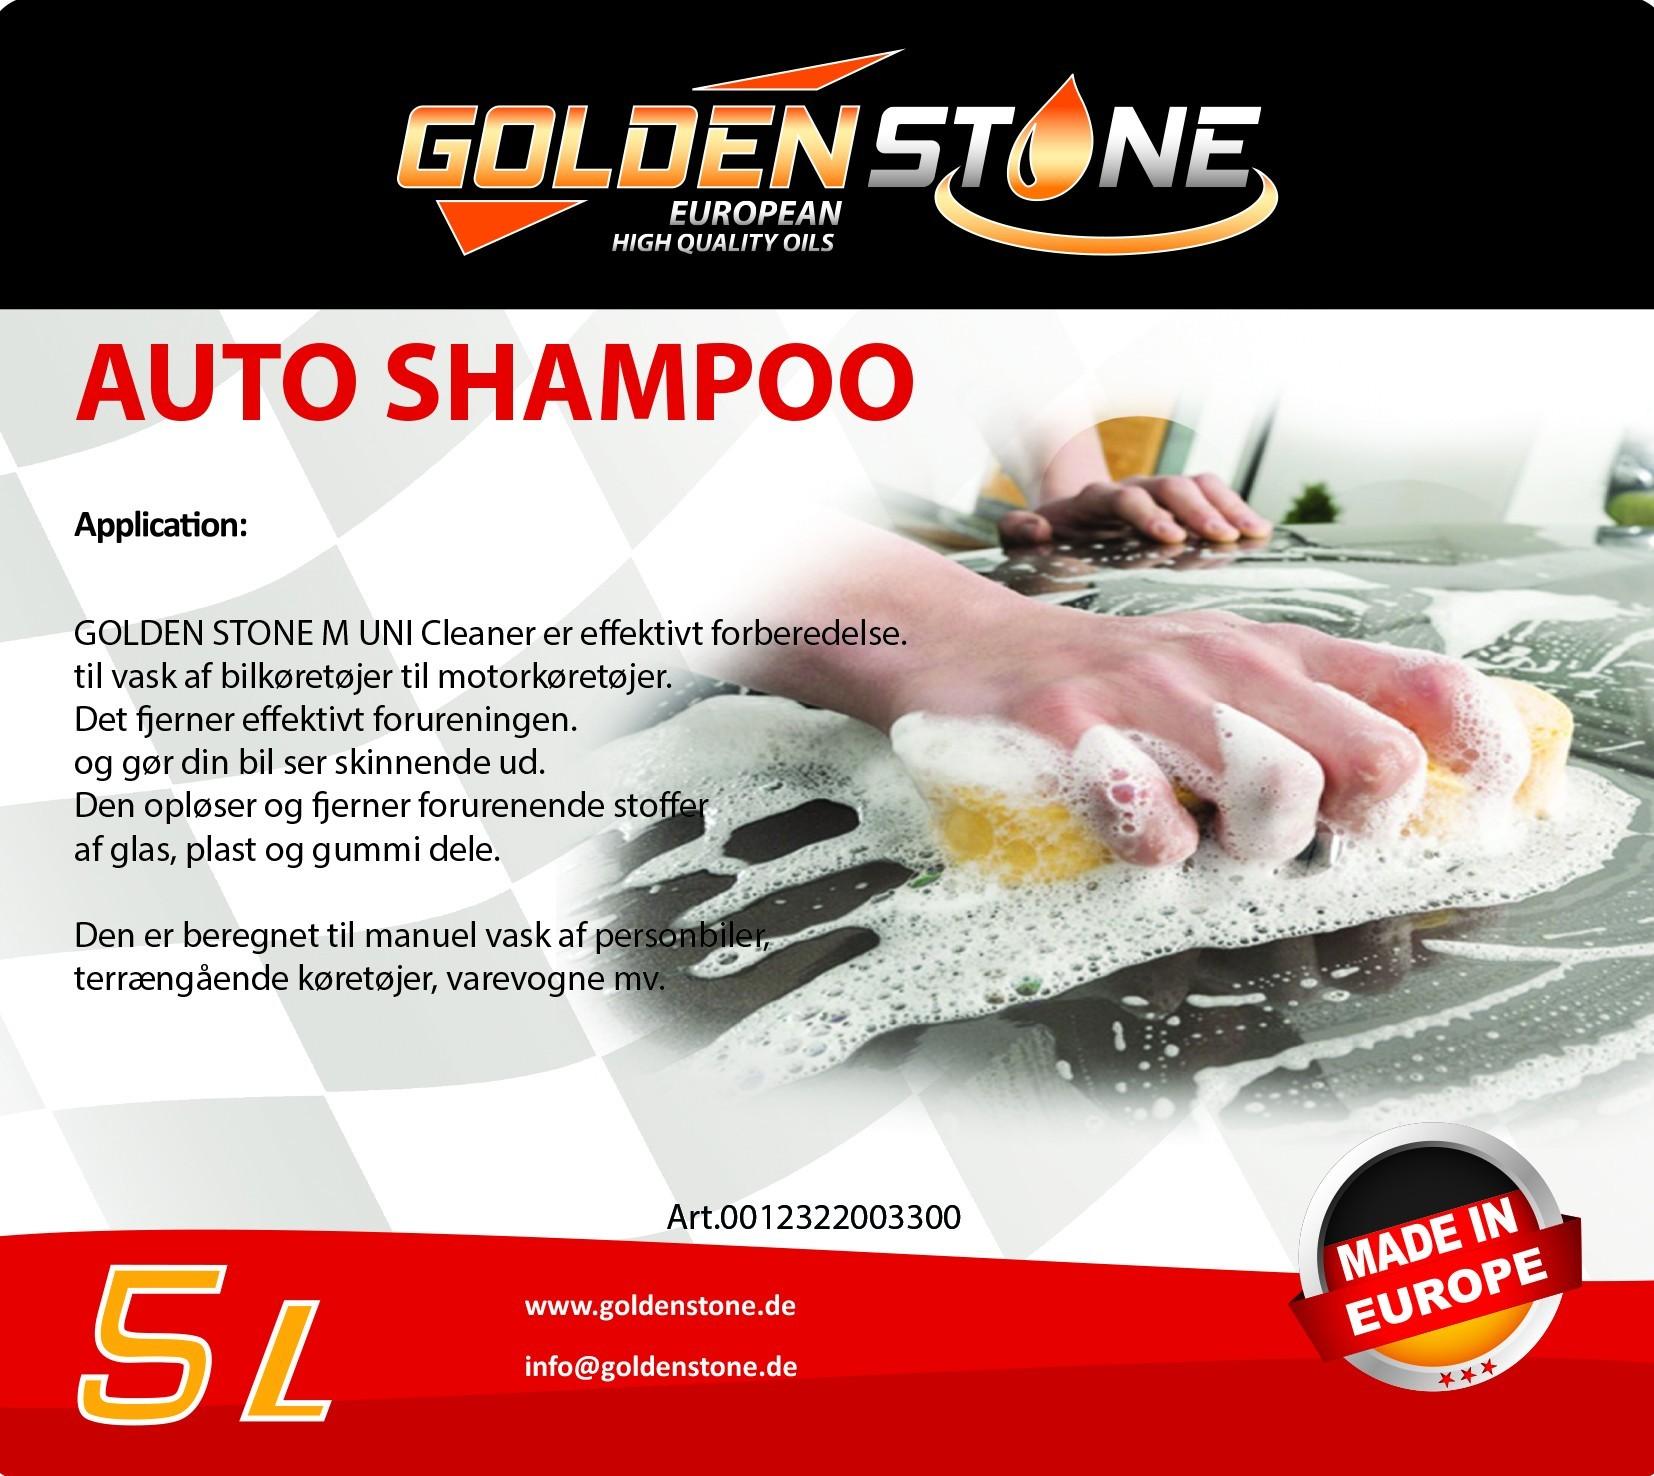 Autoshampoo 5 liter